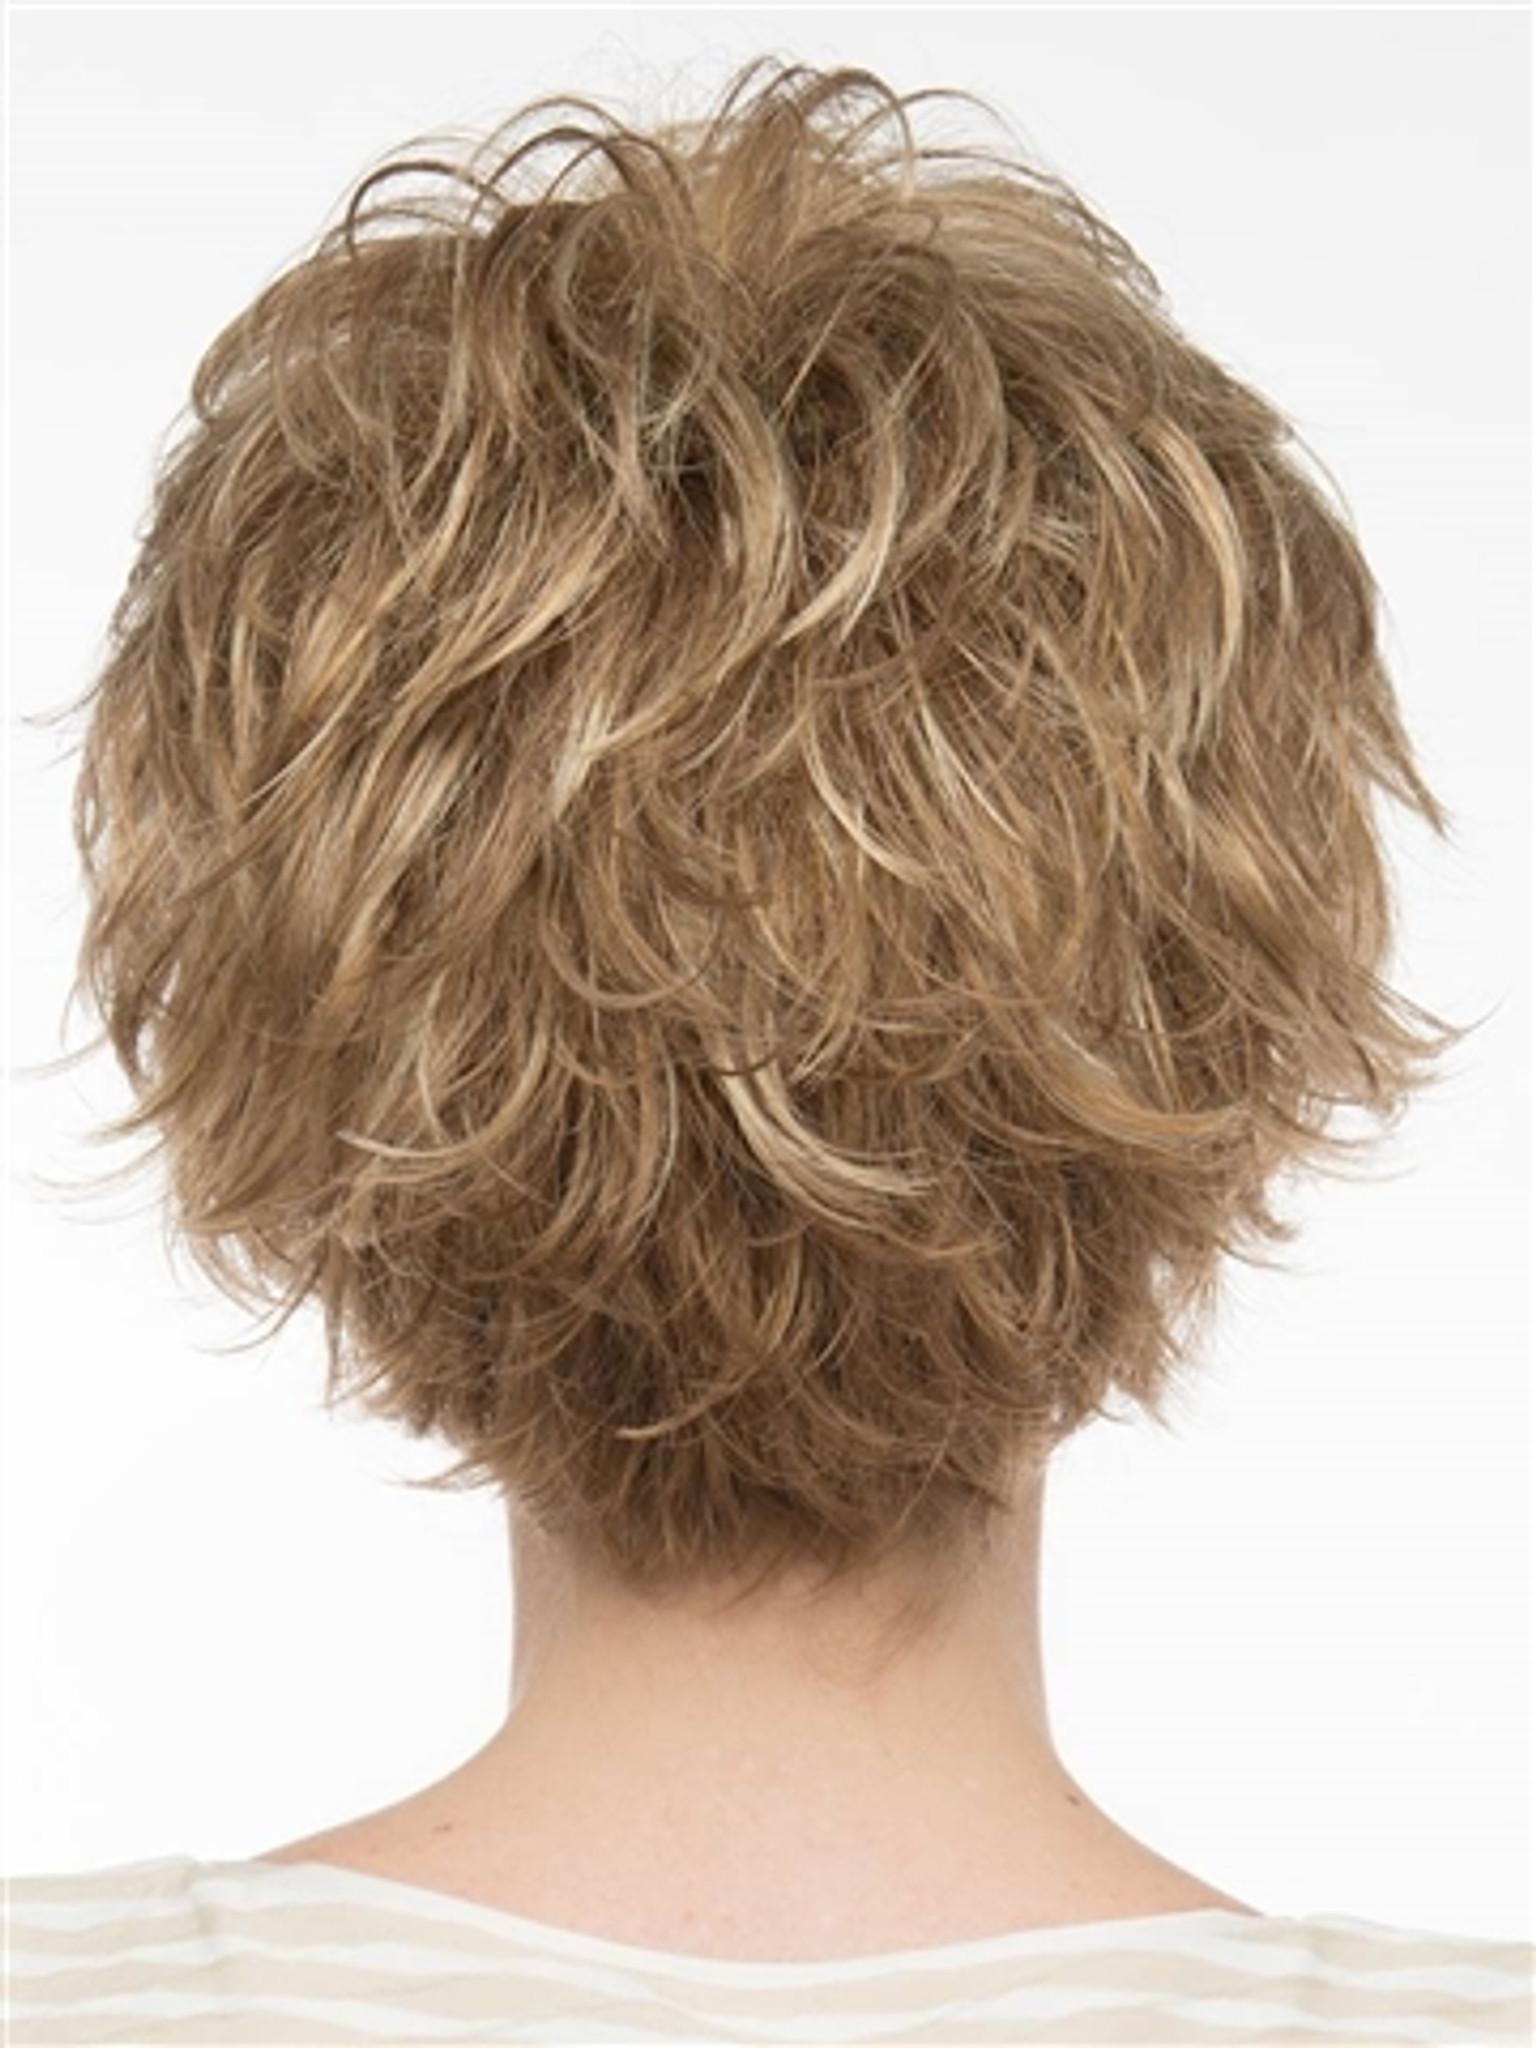 Marita Envy Wigs back view